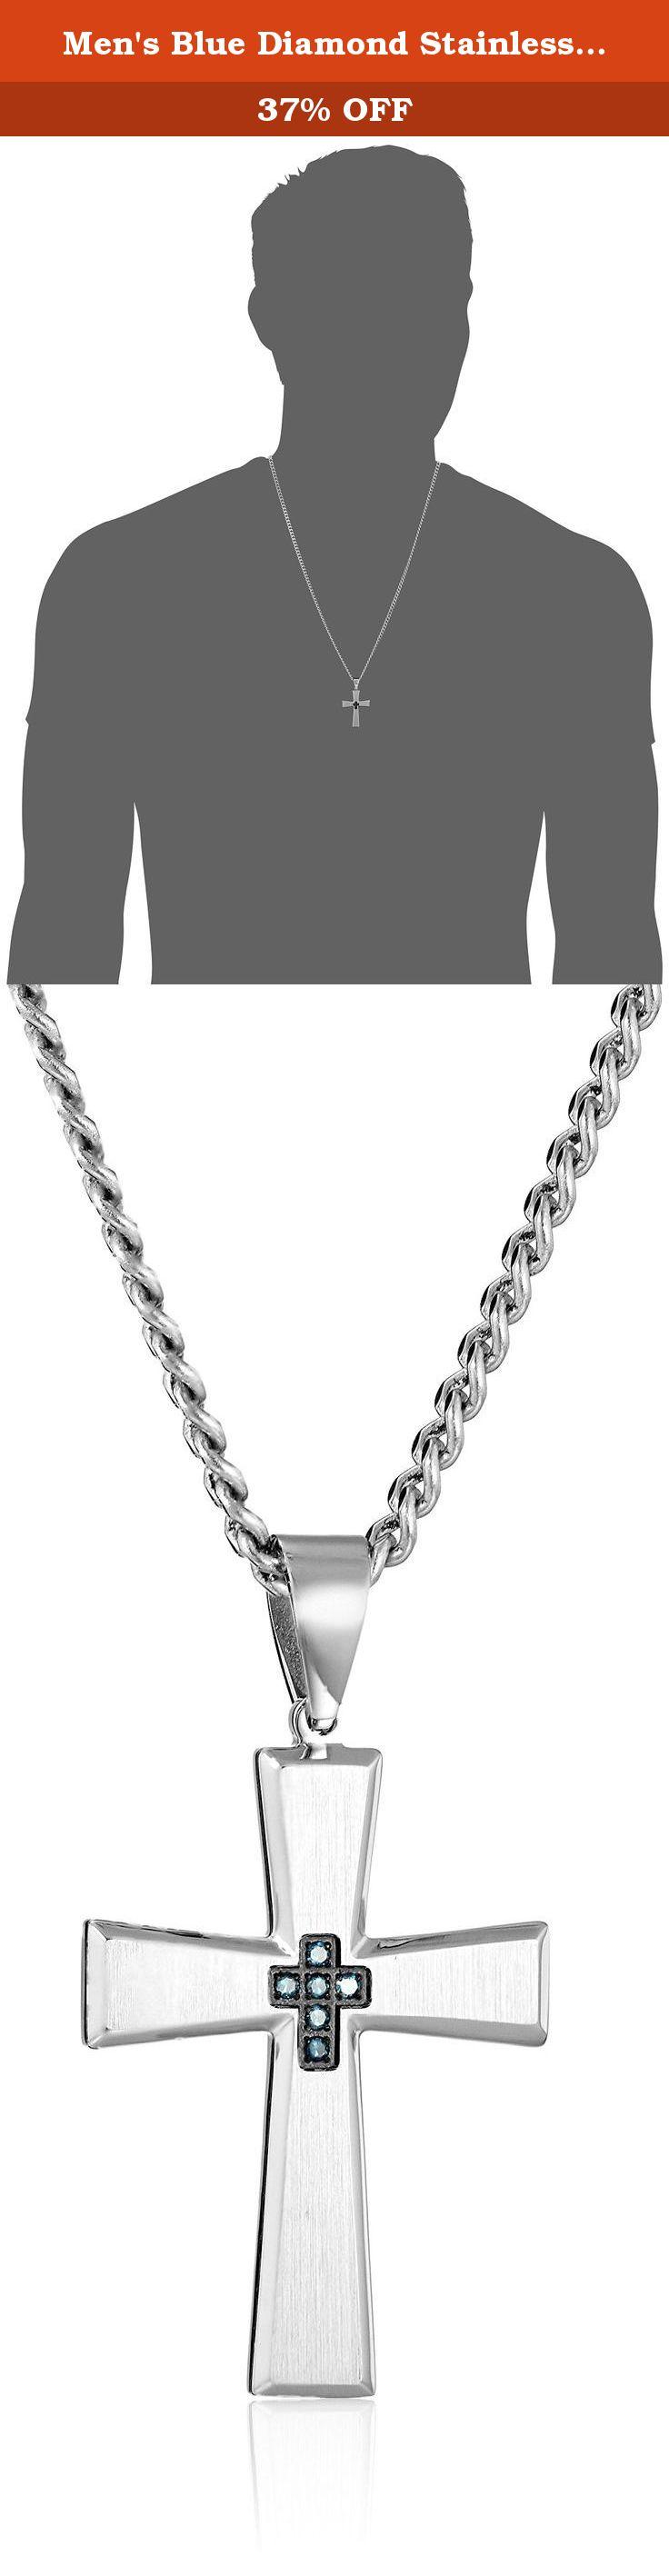 Men s Blue Diamond Stainless Steel Cross Pendant Necklace 24